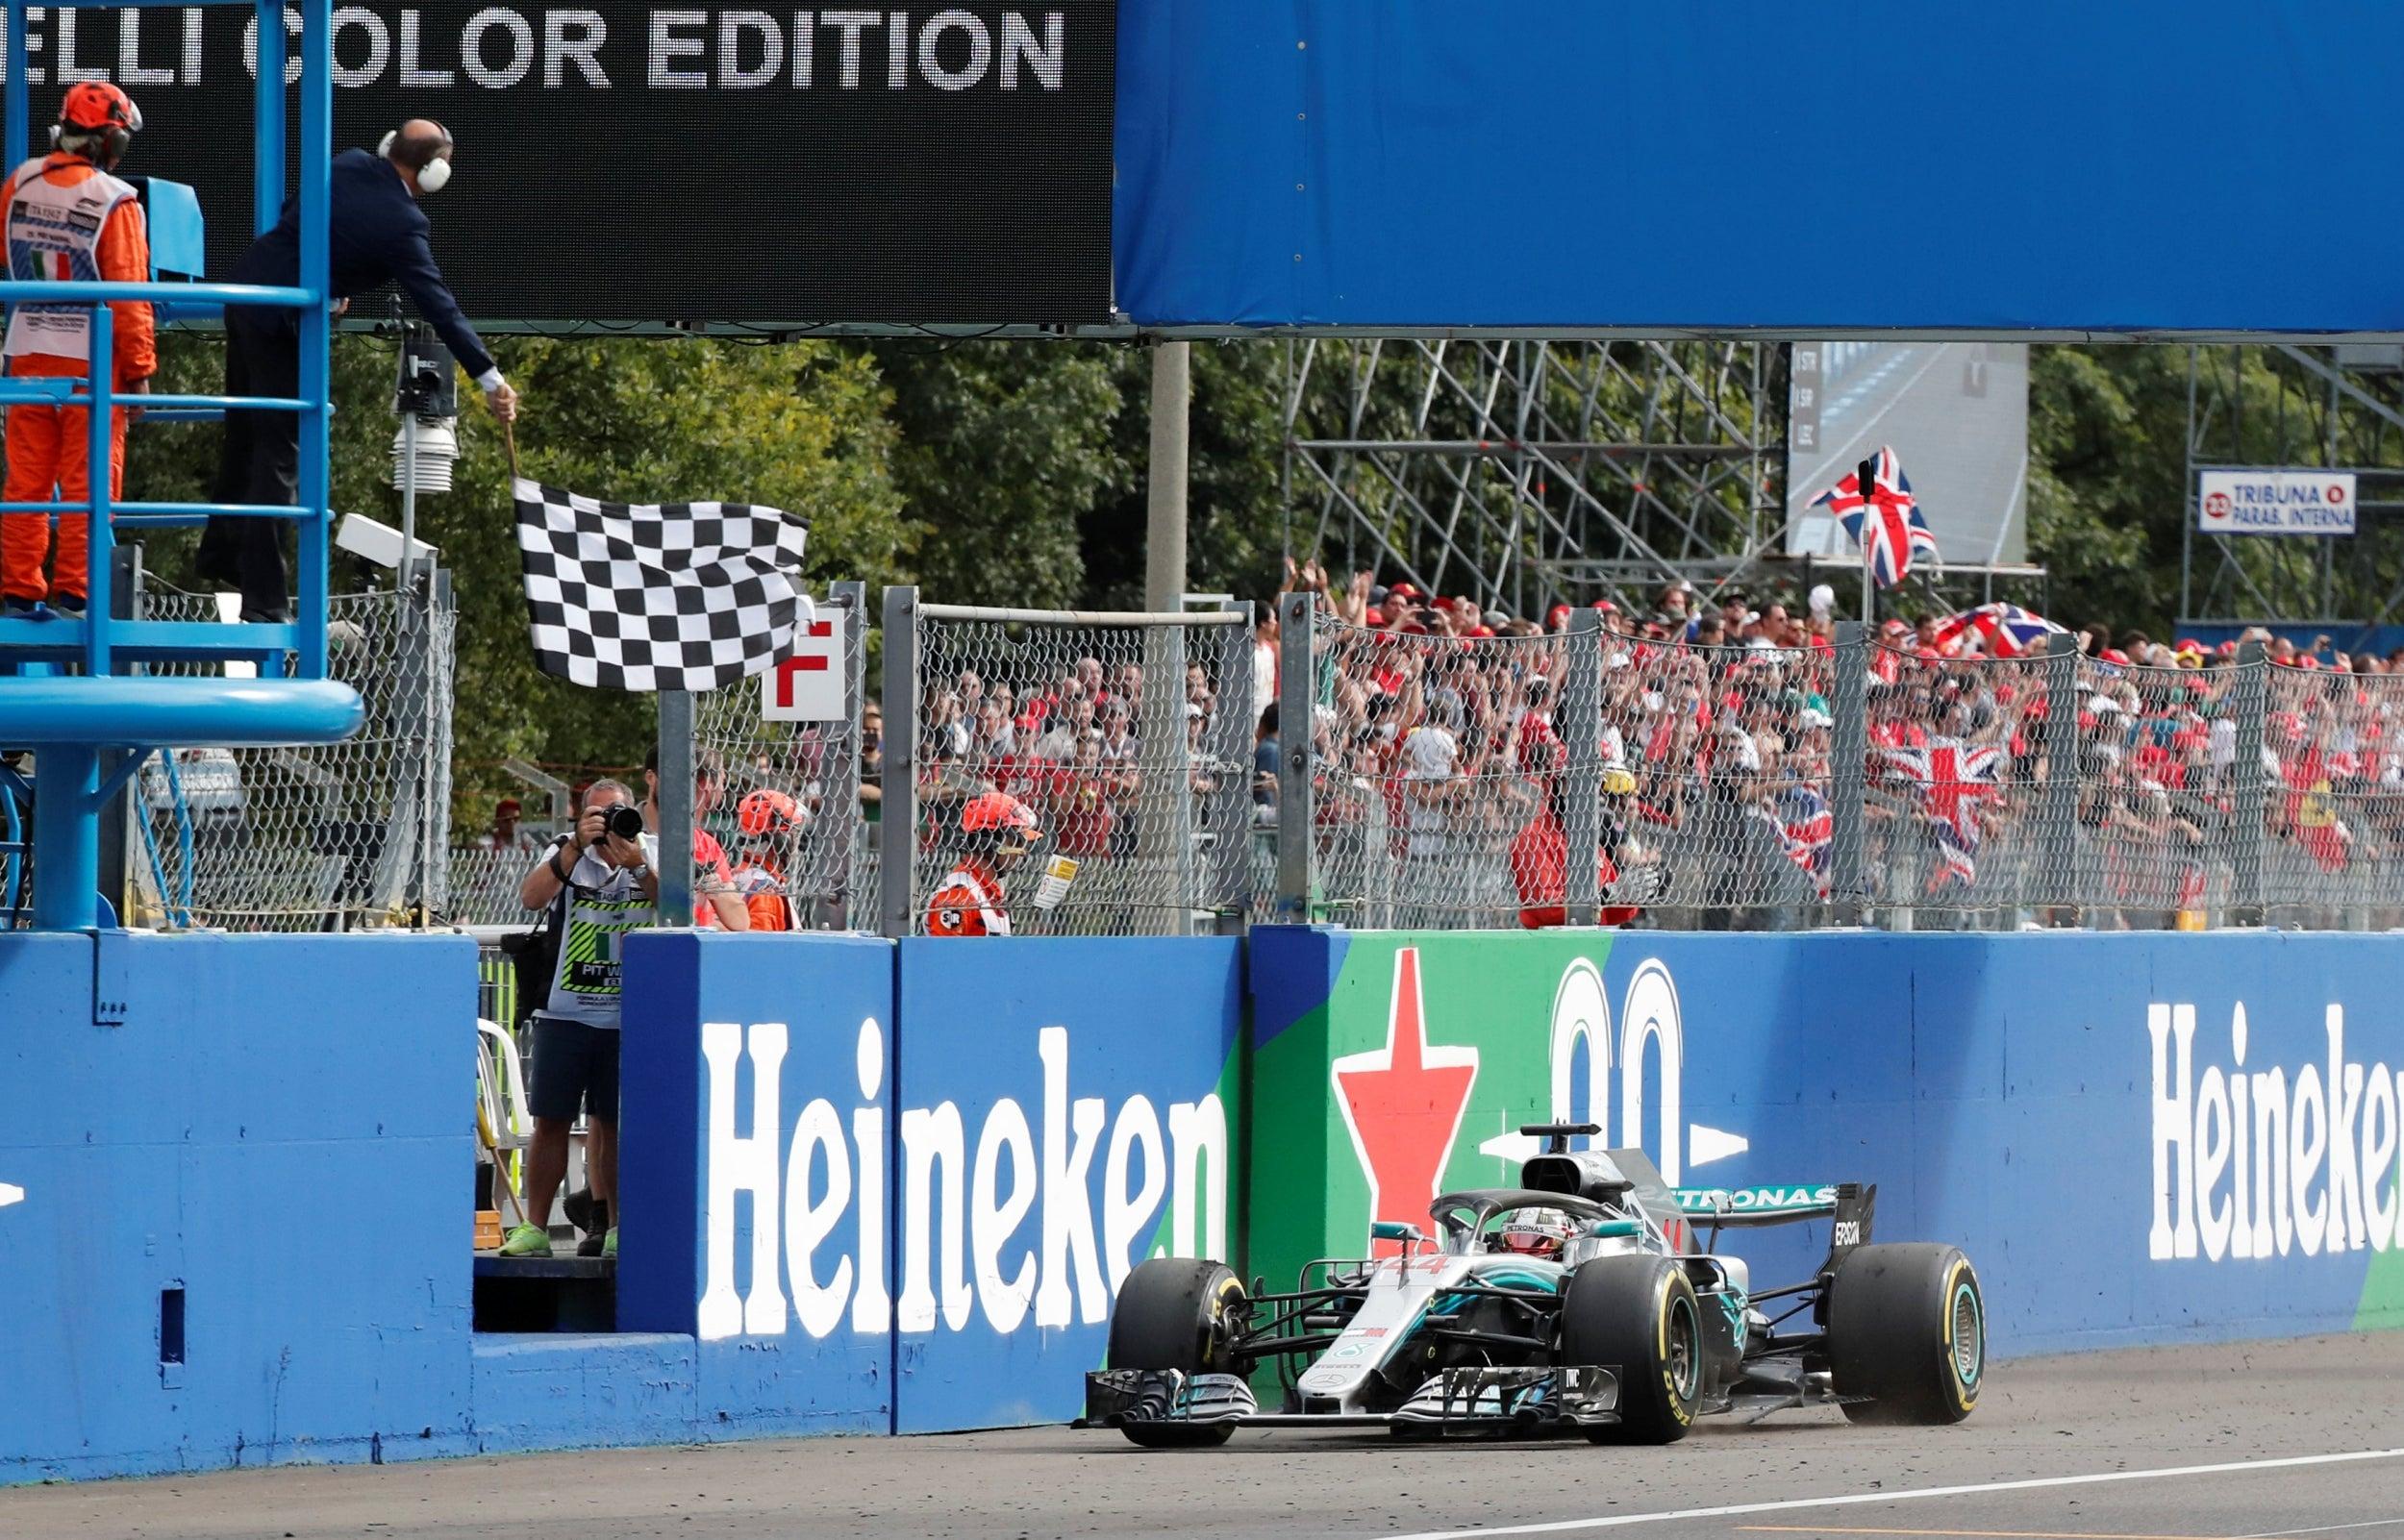 Kimi Raikkonen to leave Ferrari at end of the season and